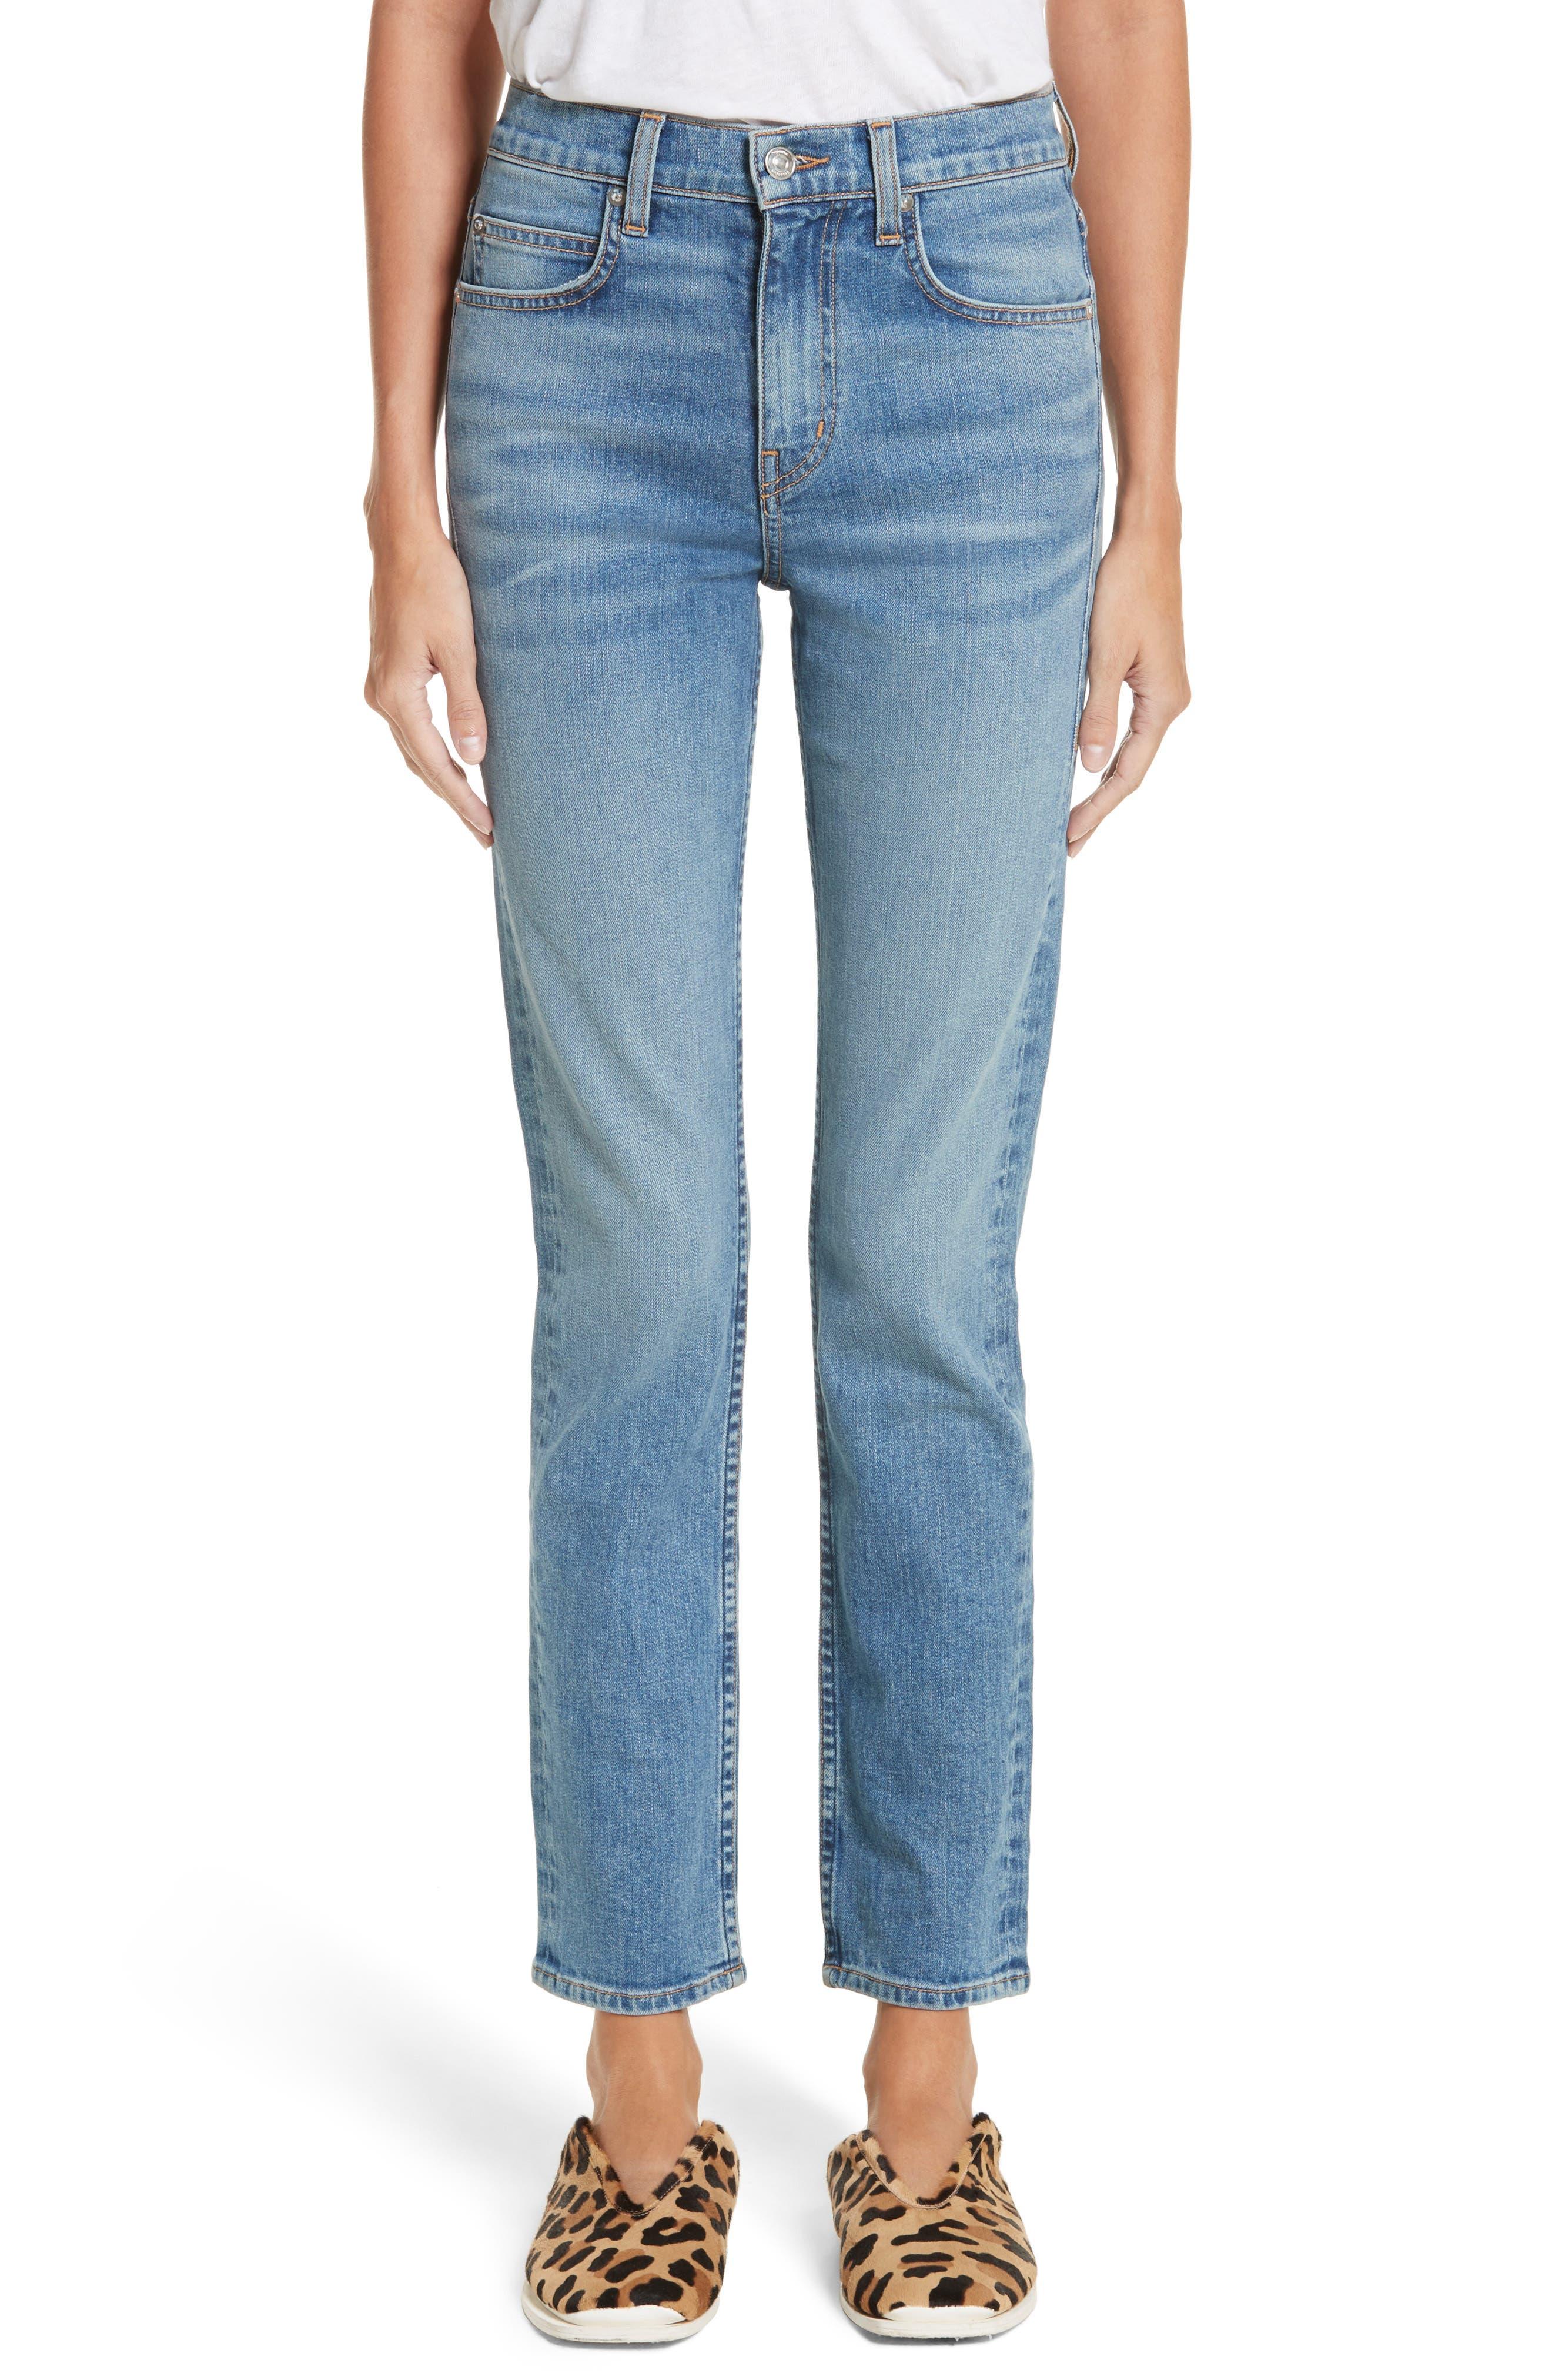 PSWL Straight Leg Jeans,                         Main,                         color, 428